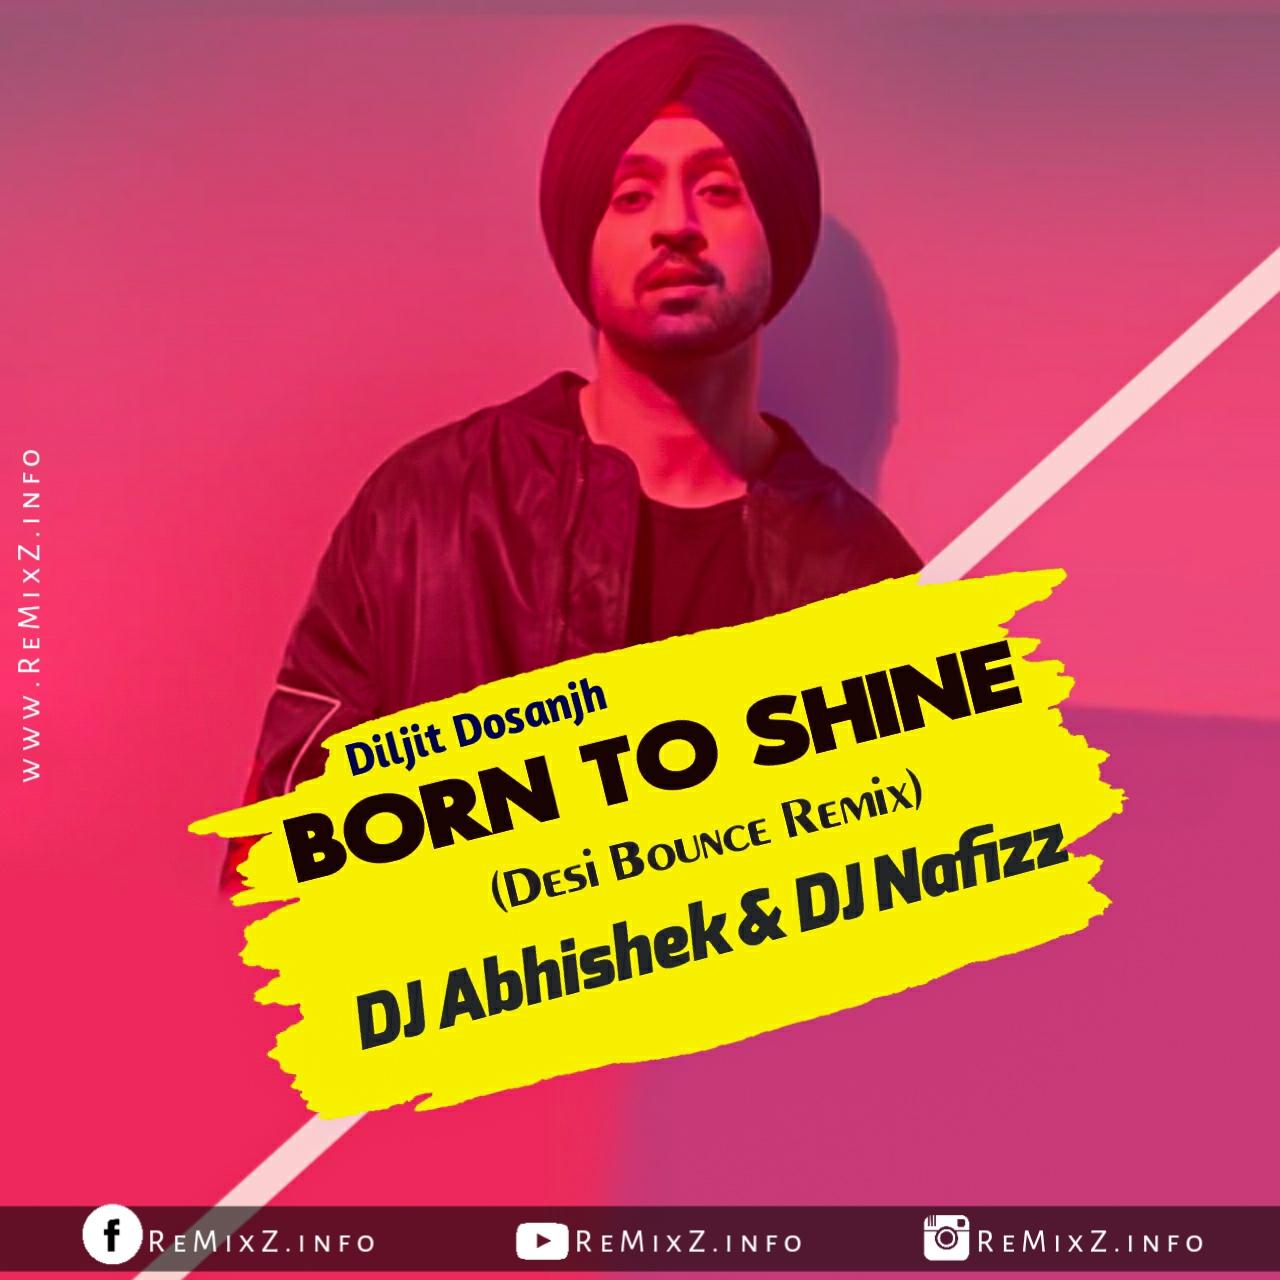 born-To-Shine-Diljit-Dosanjh-DJ Abhishek-DJ-Nafizz.jpg